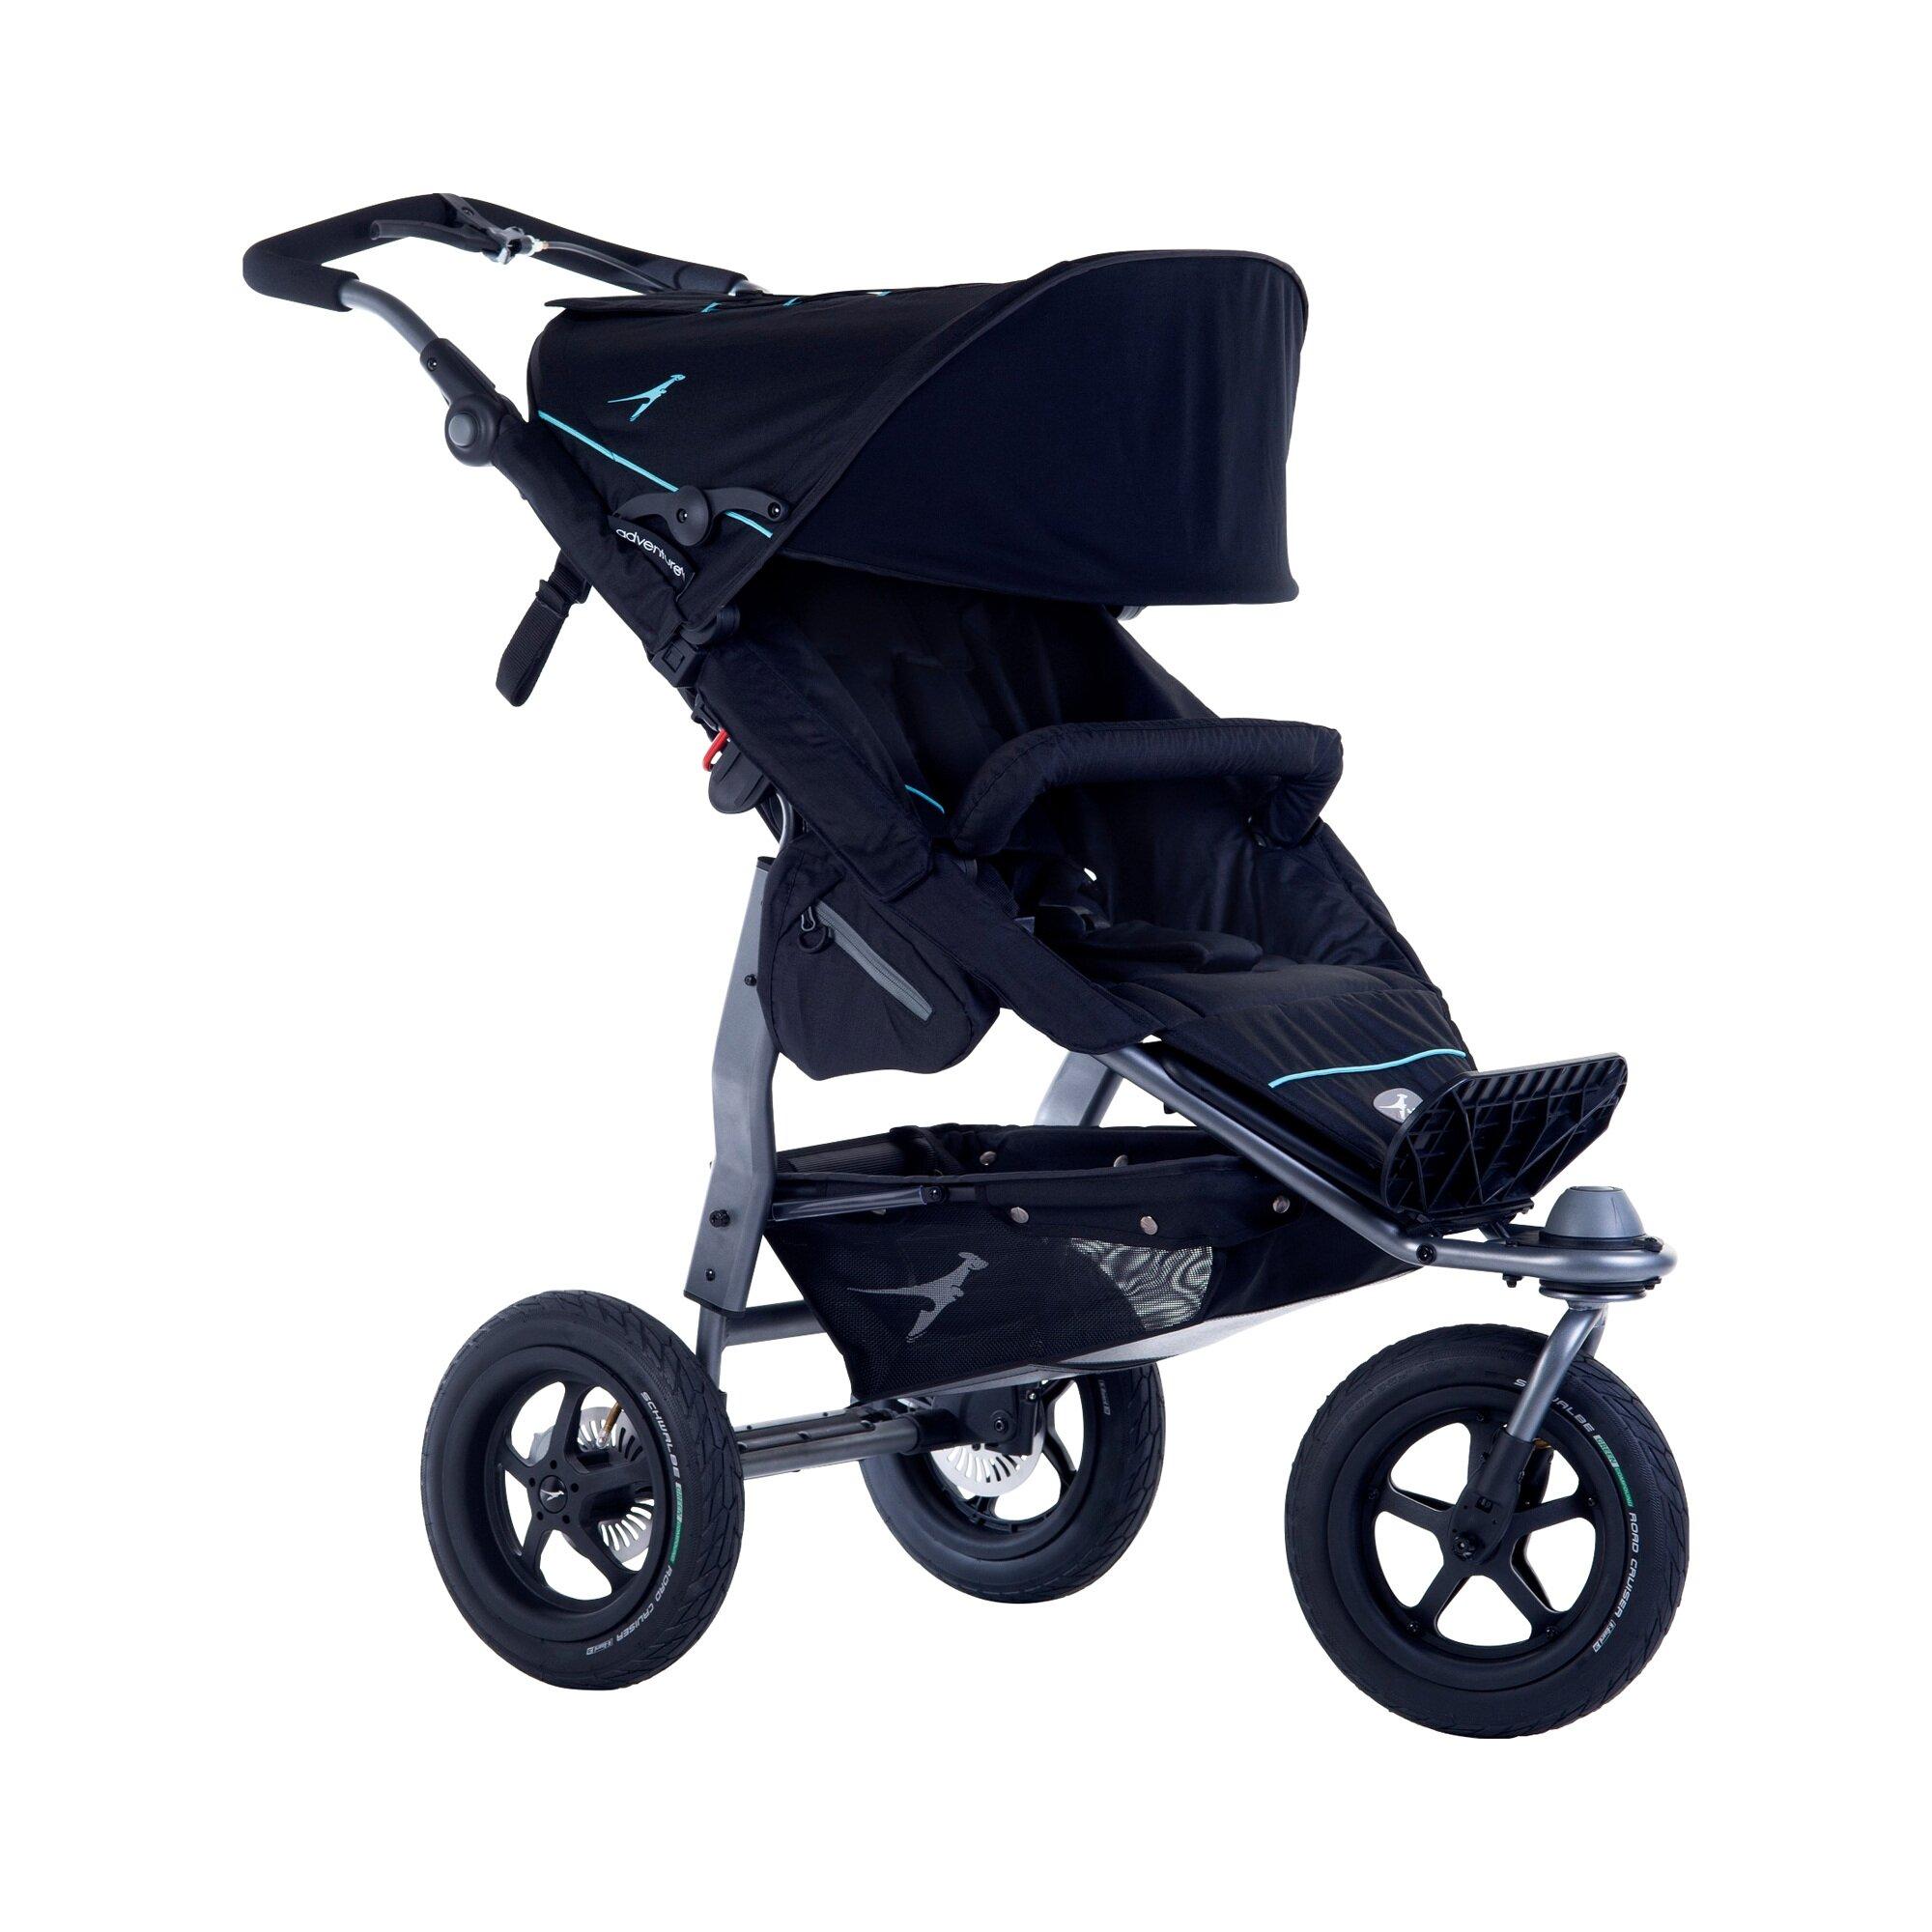 tfk-joggster-adventure-2-kinderwagen-schwarz